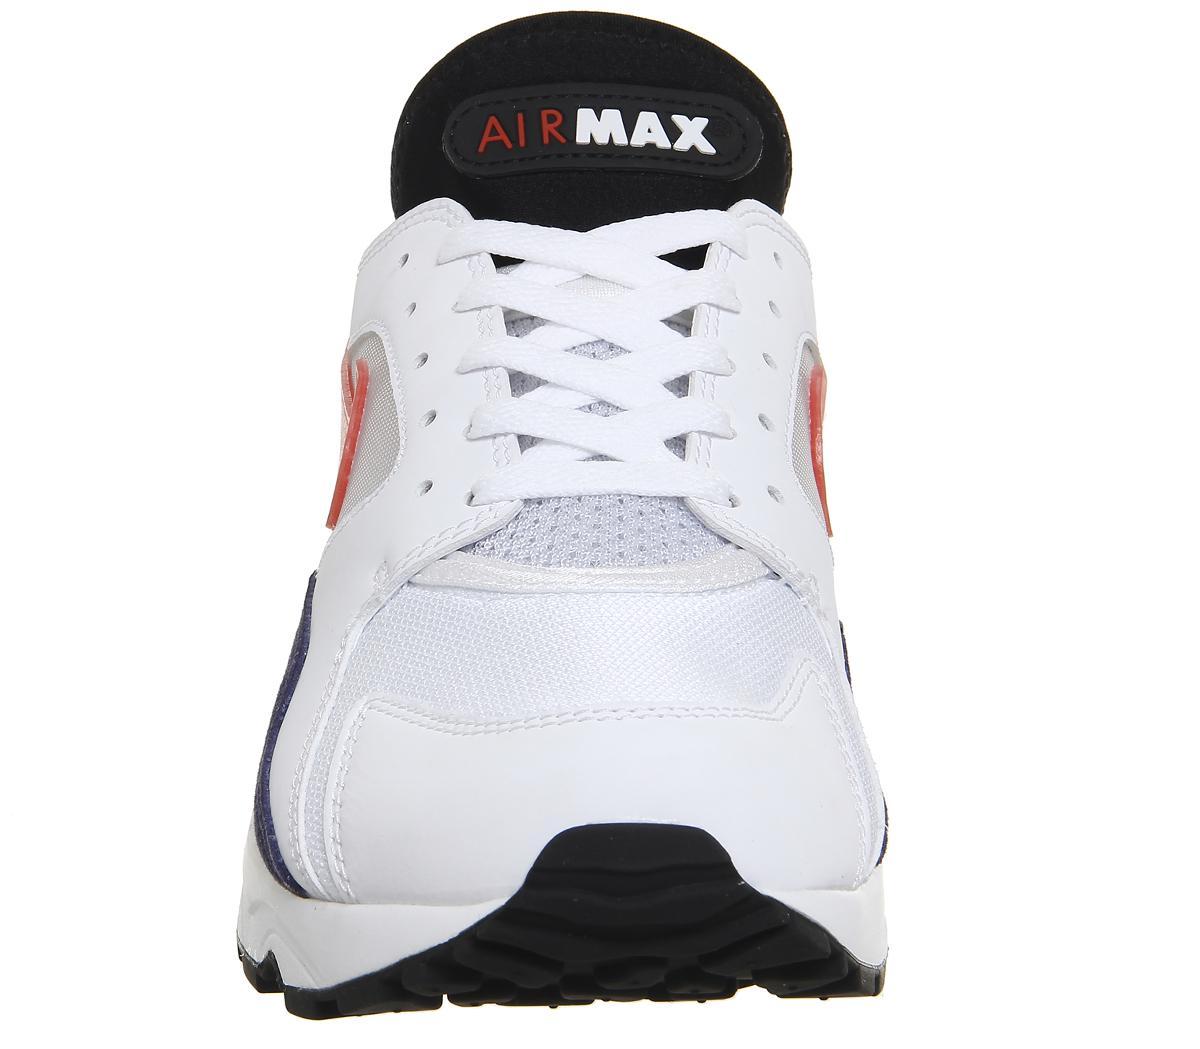 3b040fdbf46 ... release date lyst nike air max 93 trainers in white for men 299e4 7c68e